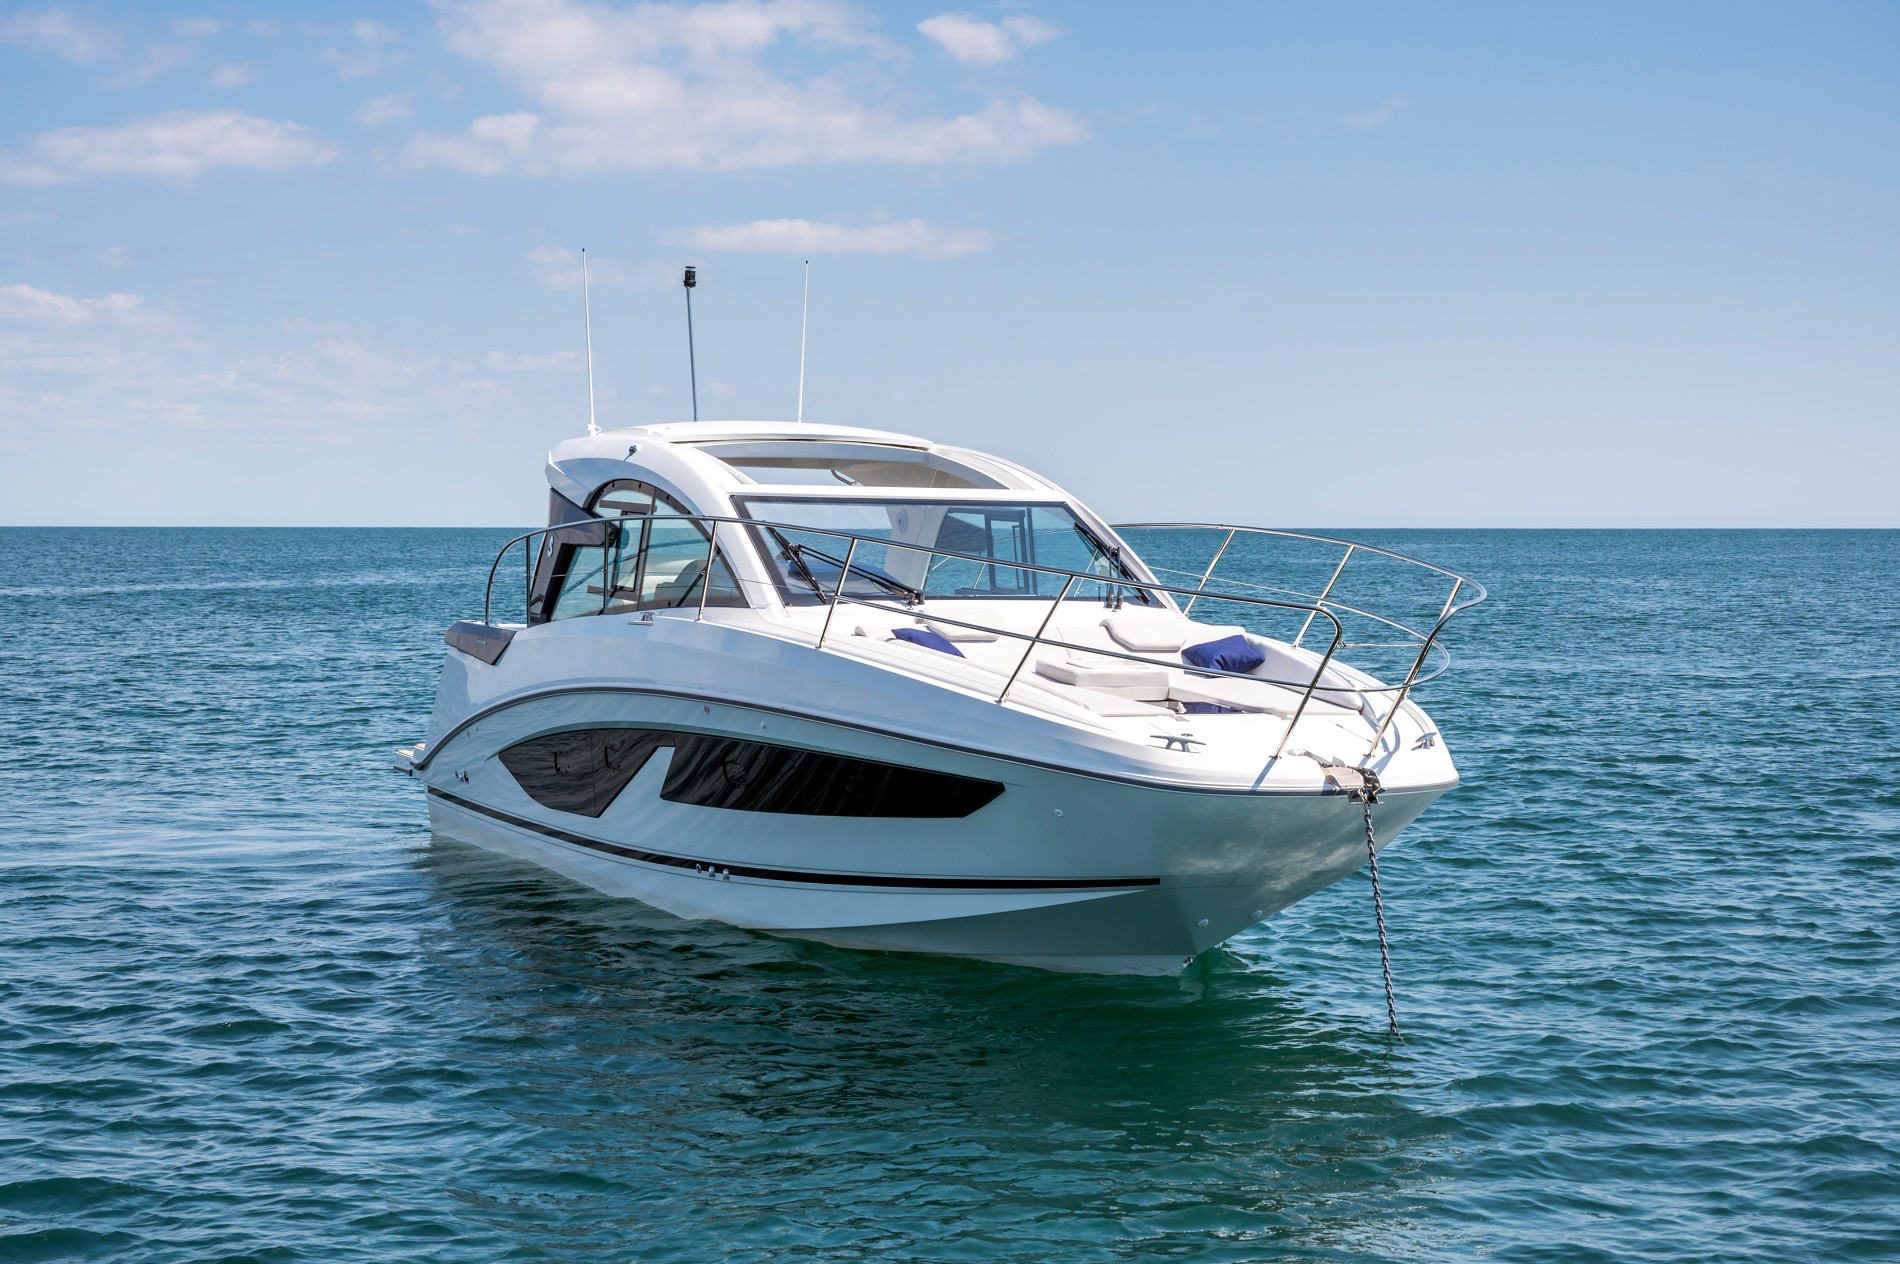 Beneteau Gran Turismo 36 inboard